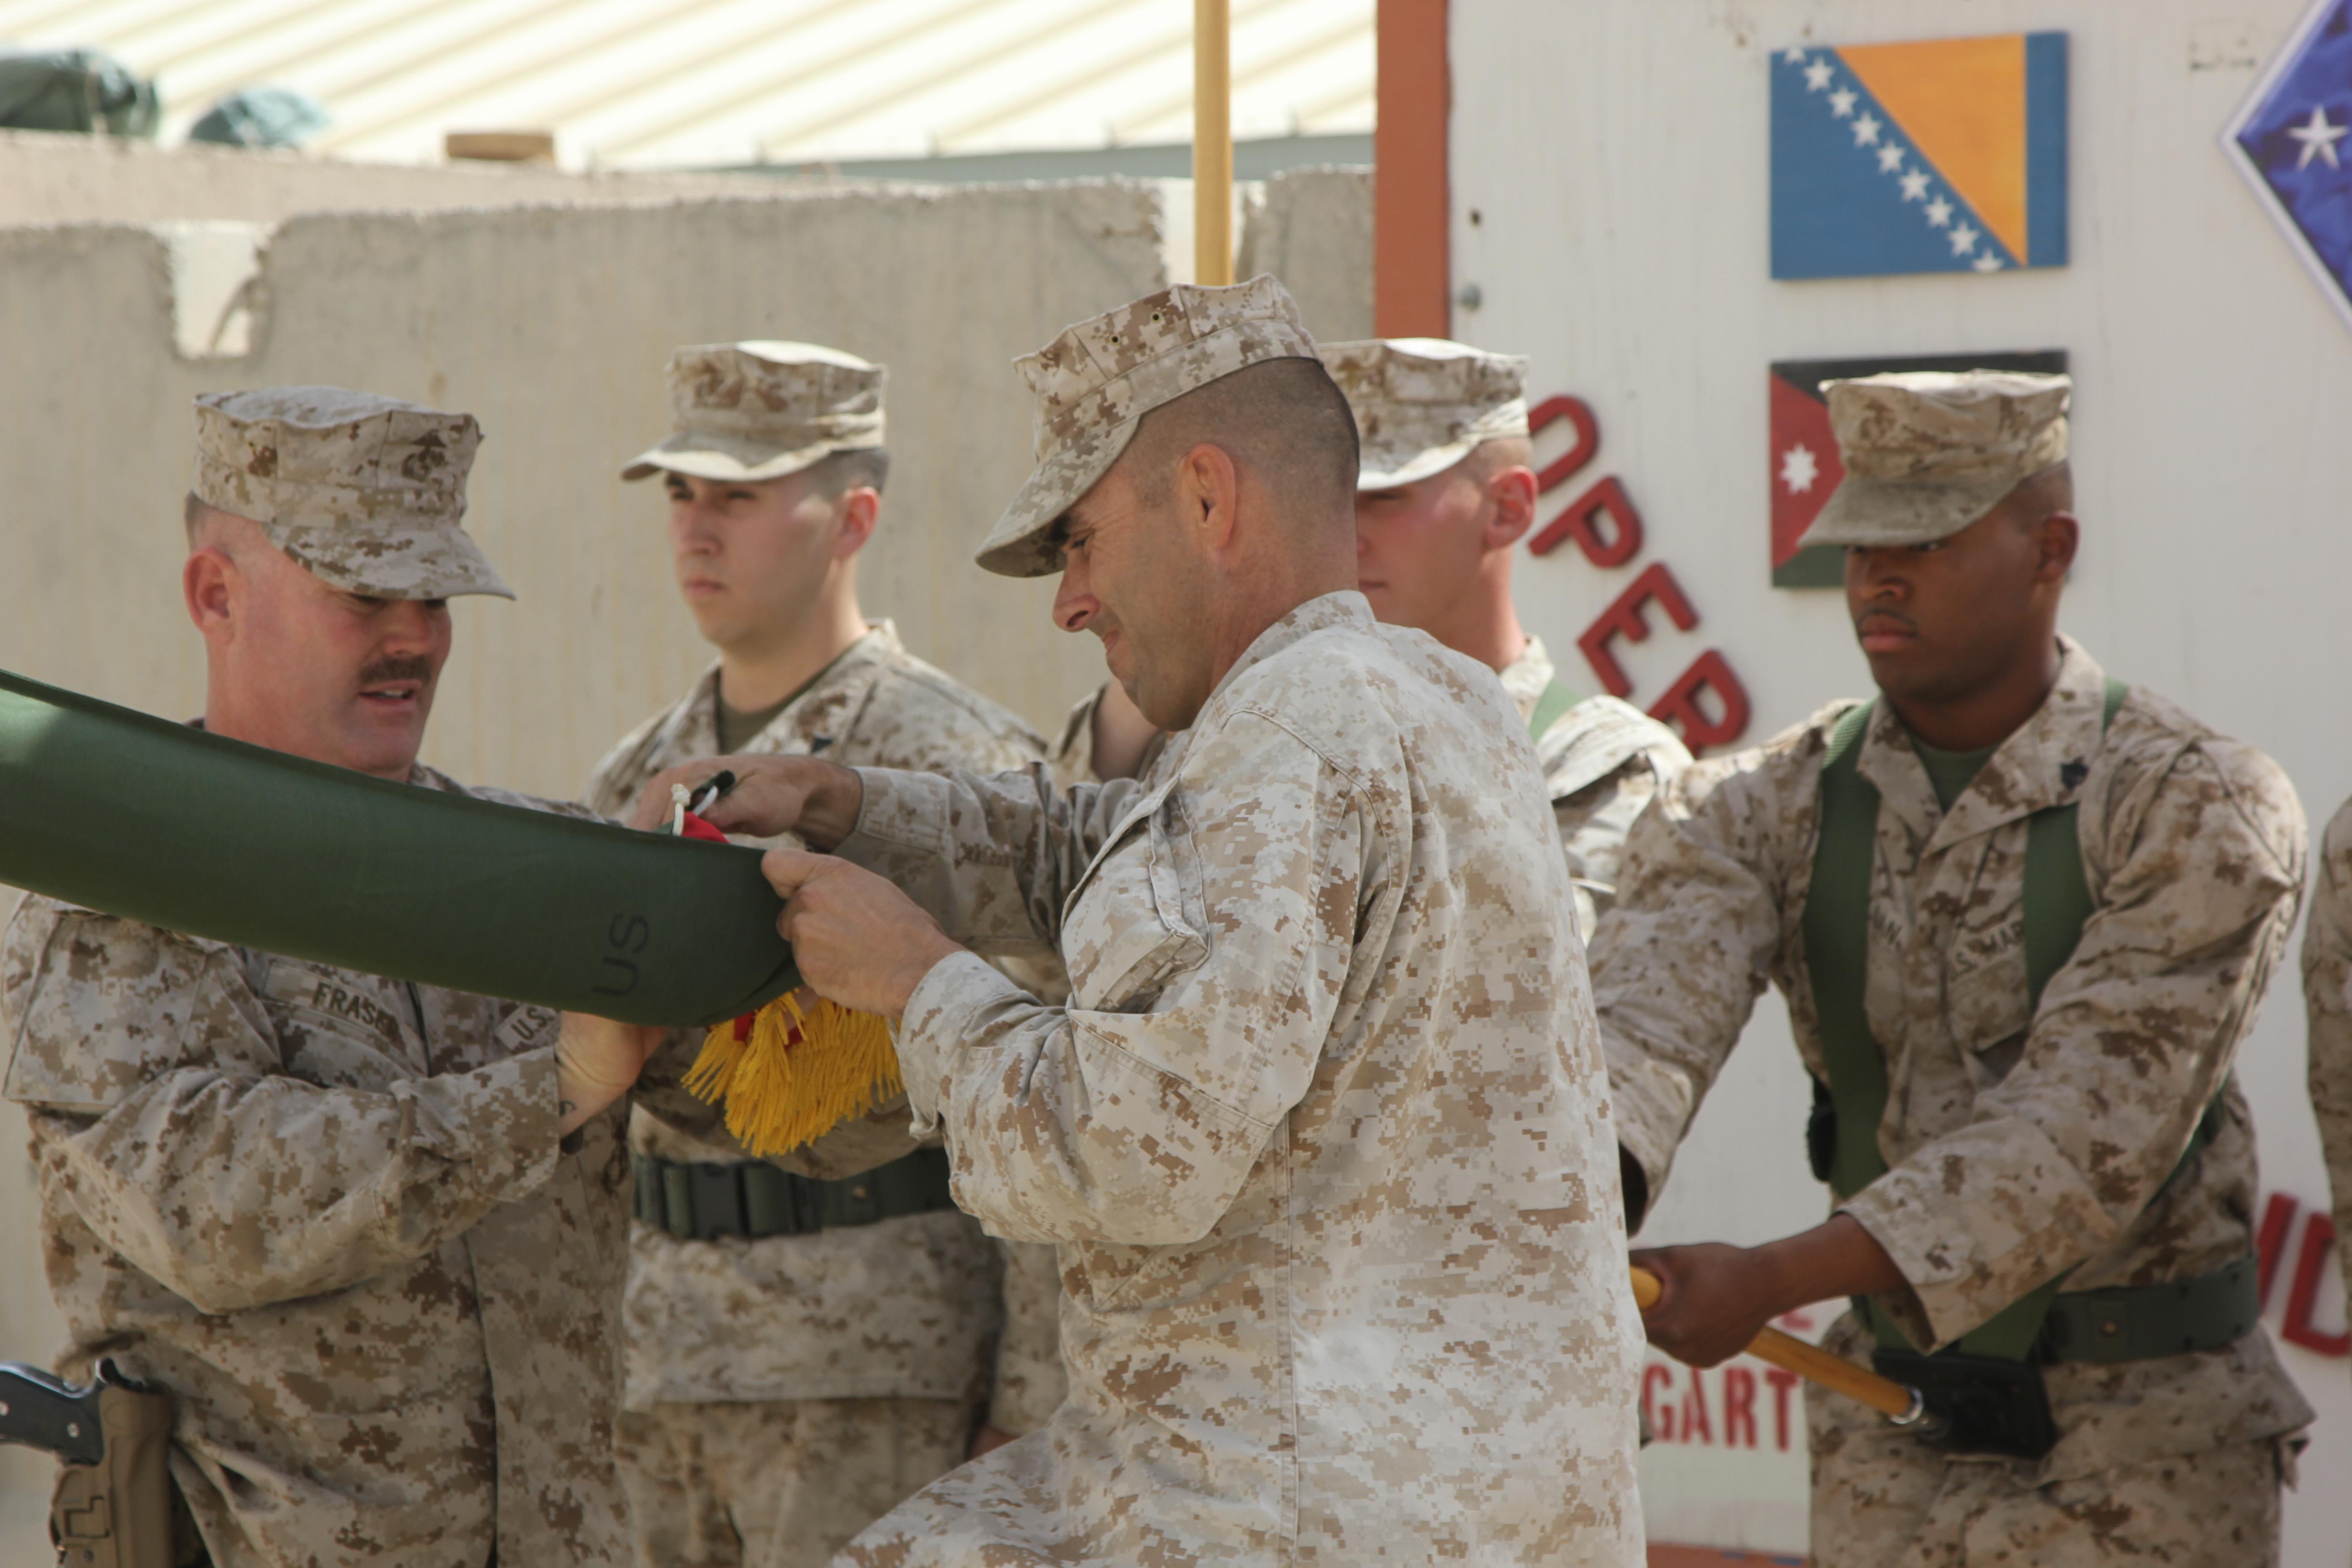 st marine regiment cases colors ends mission in > i hi res photo